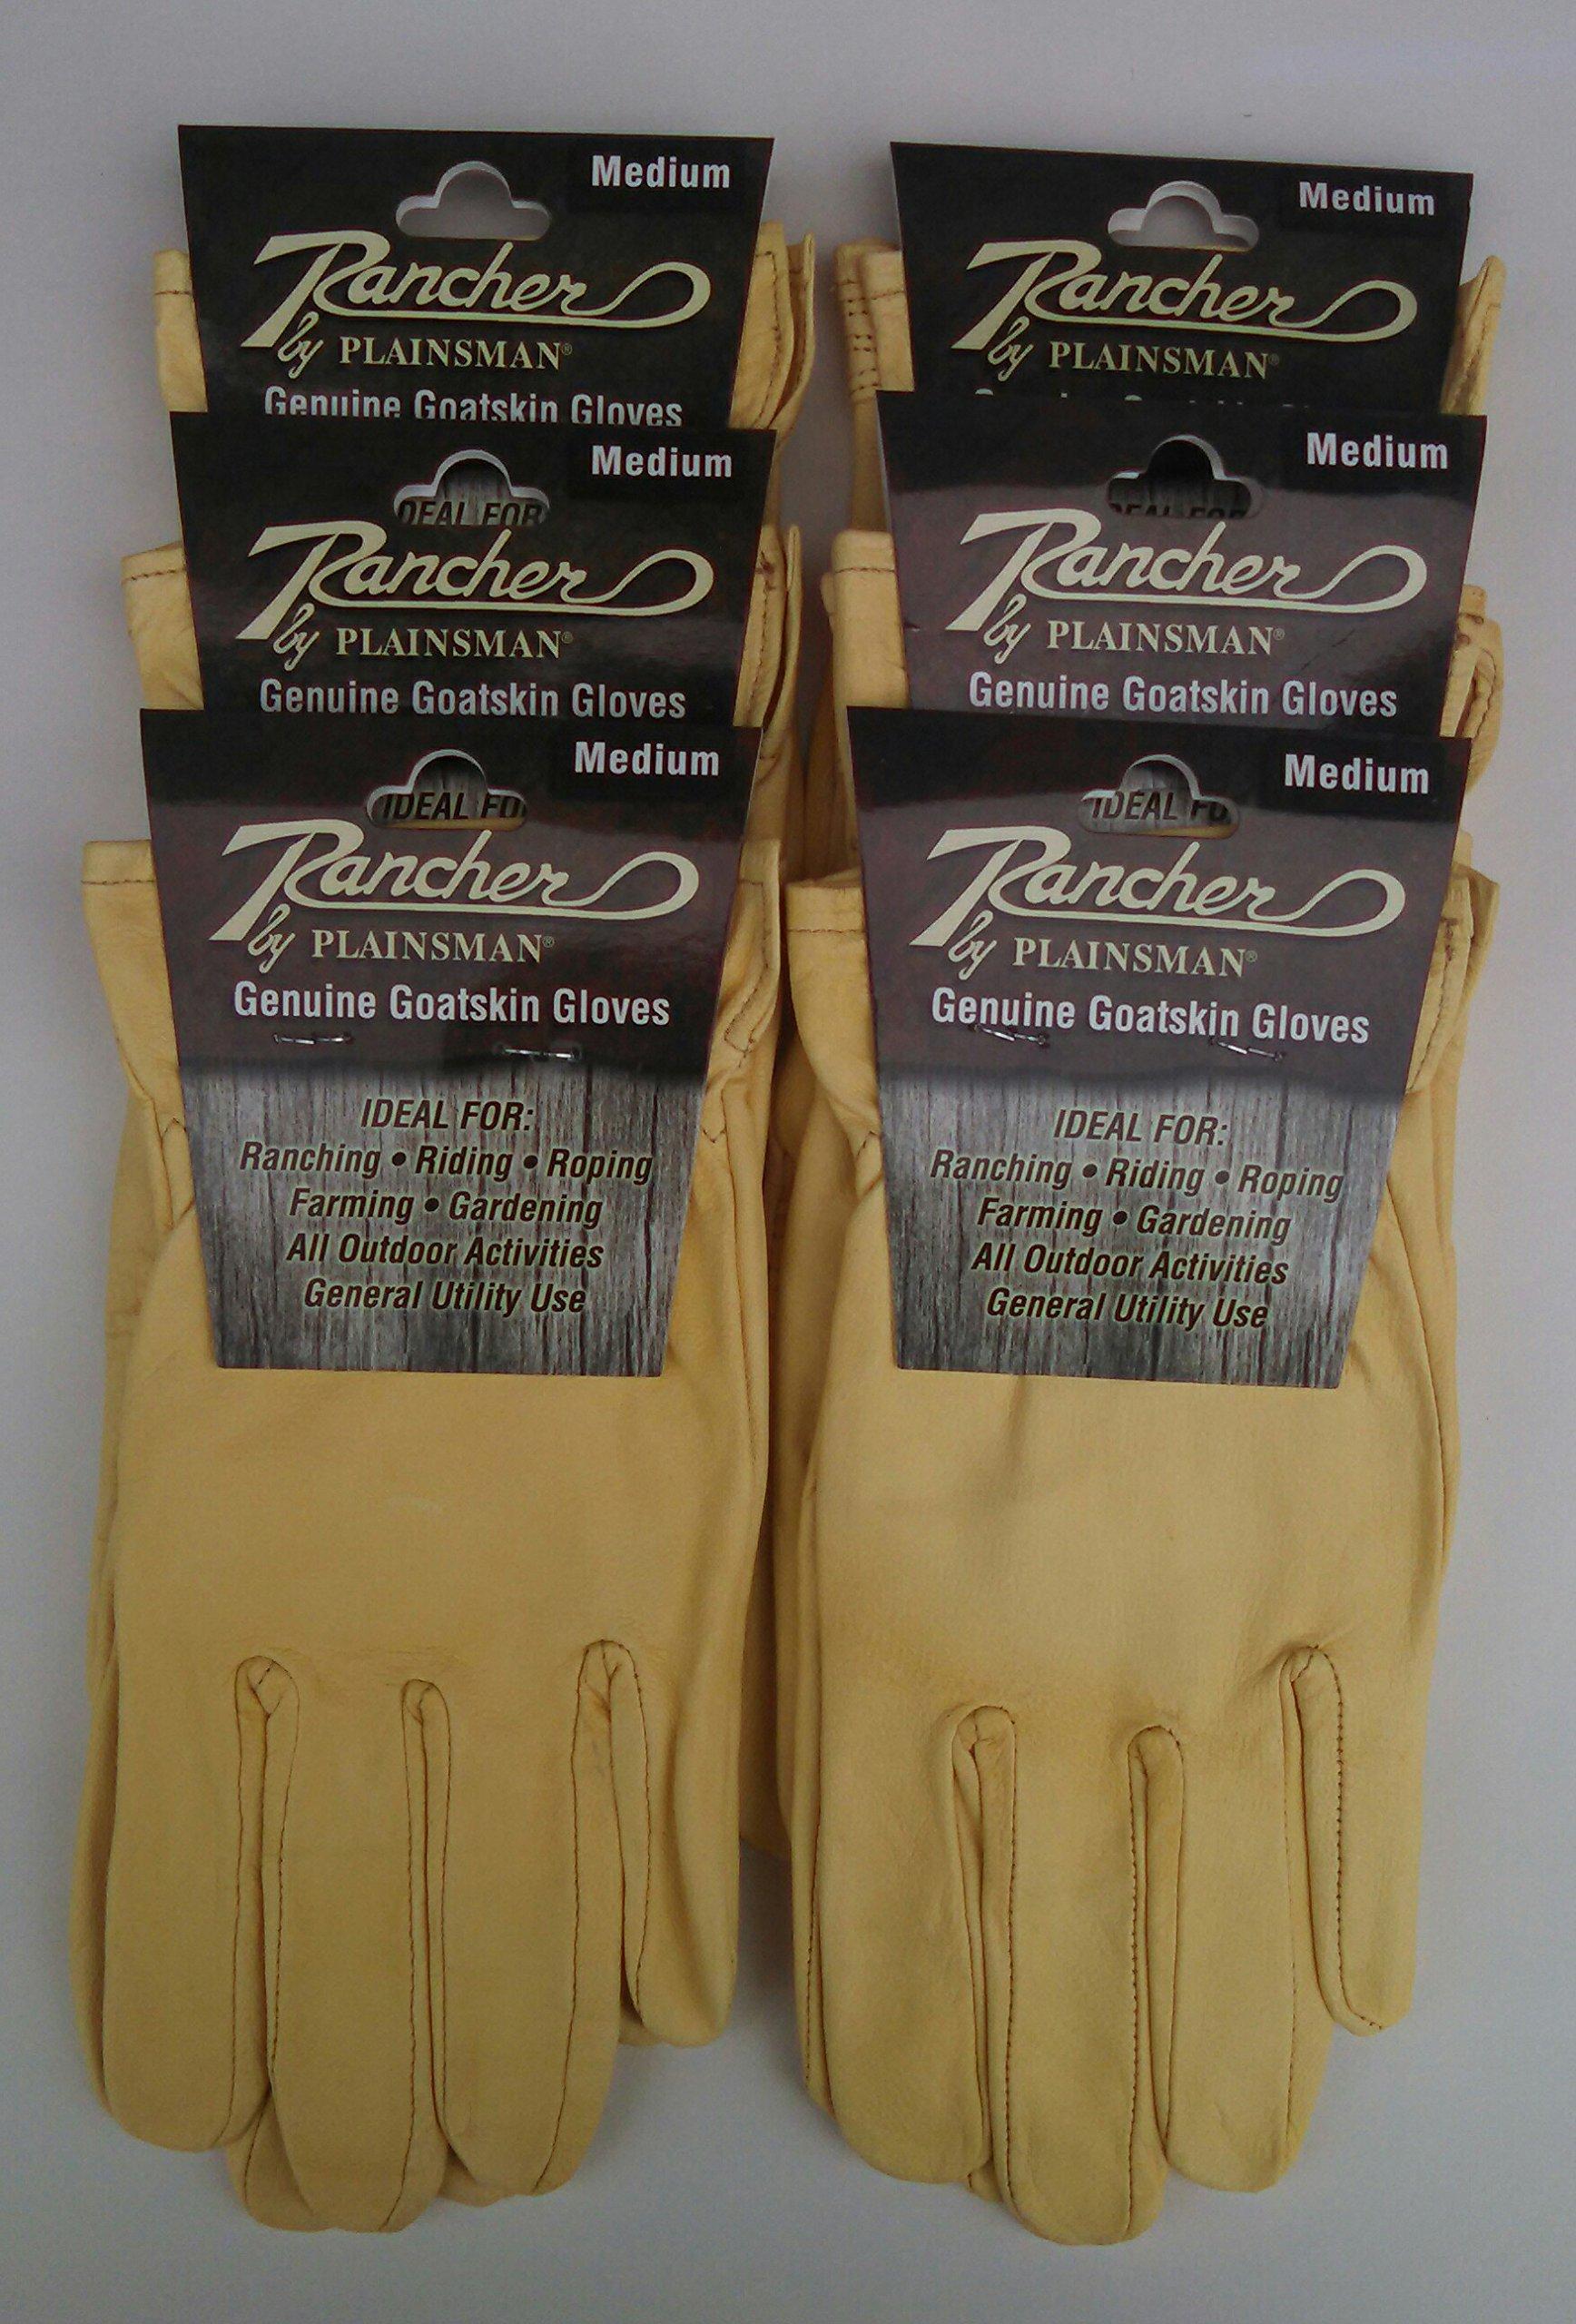 Rancher By Plainsman Goatskin Cabretta Leather Gloves MEDIUM 6 Pair Bundle